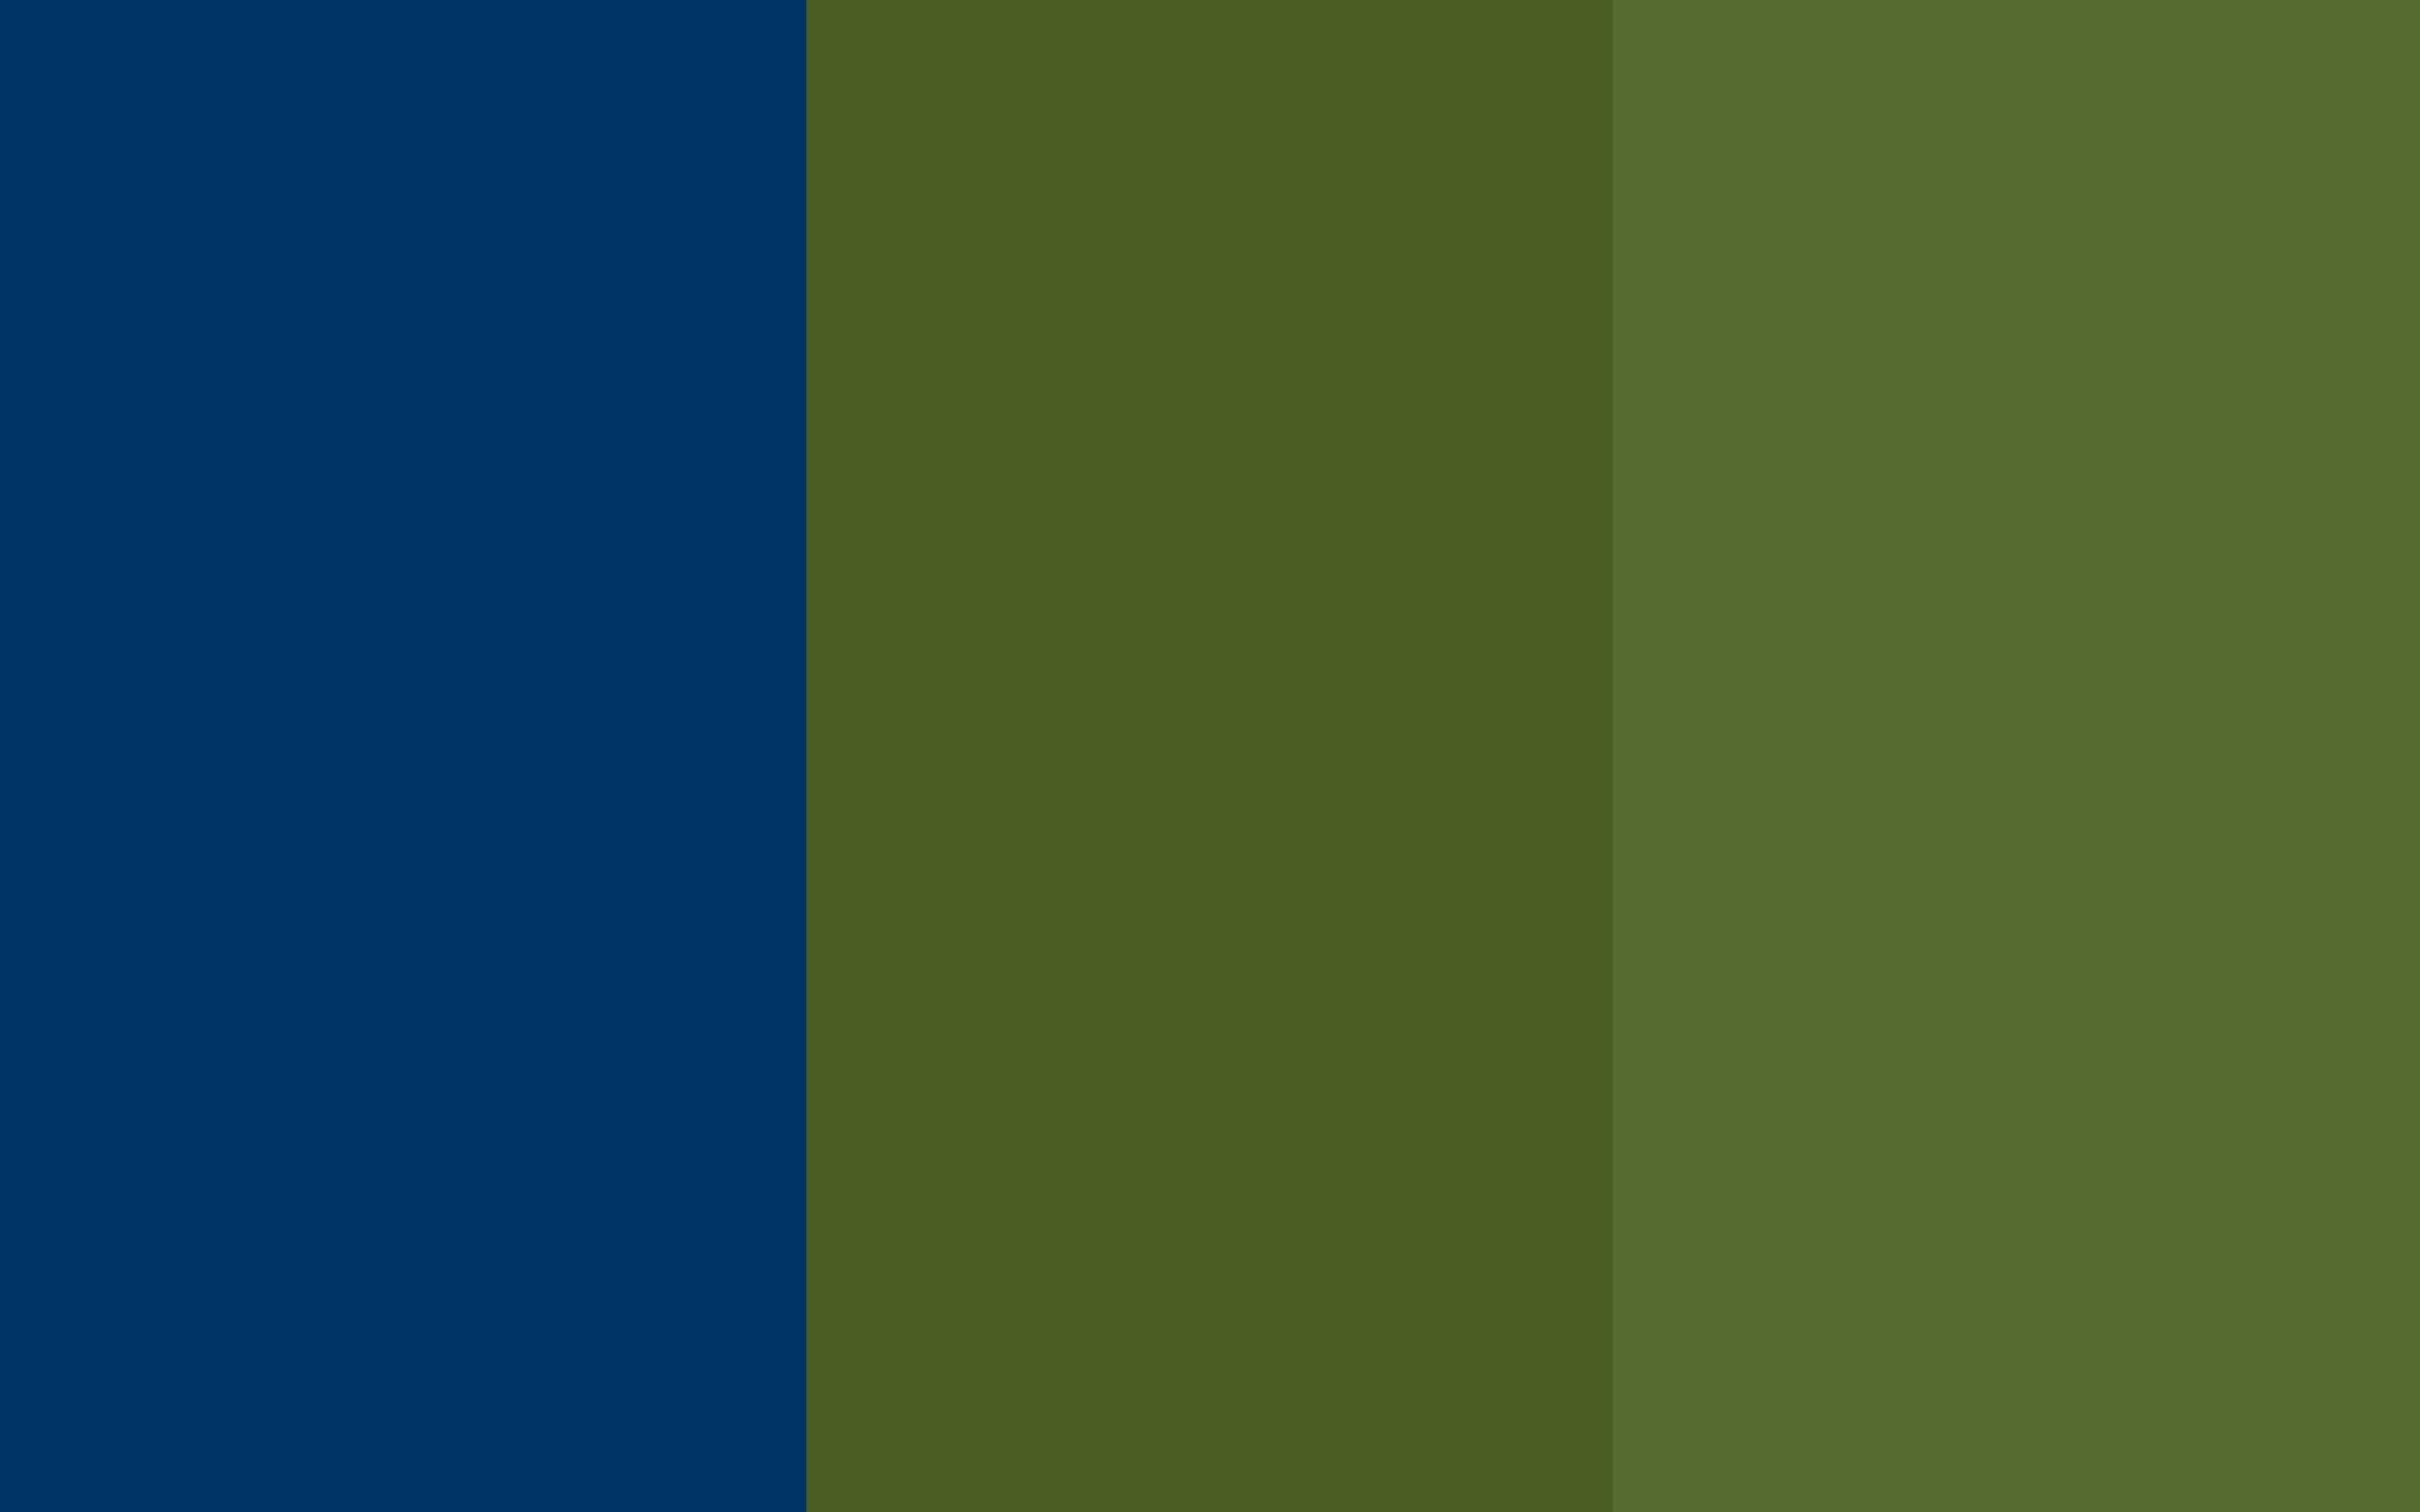 resolution dark moss green - photo #15